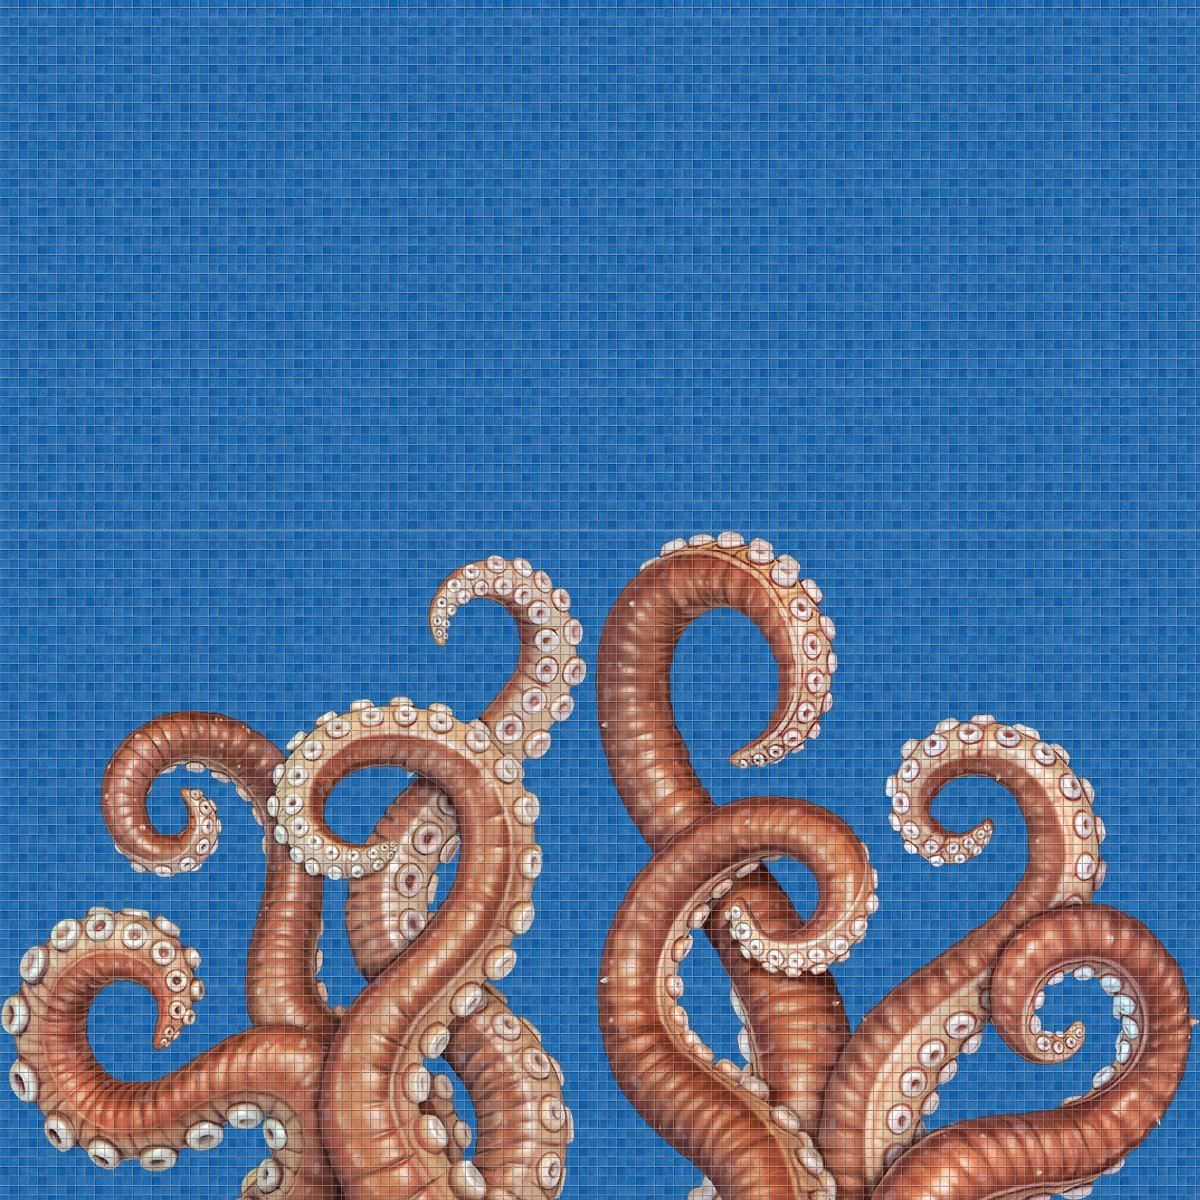 Octopus-Digital_Print-Mosaic-Ezarri.jpg